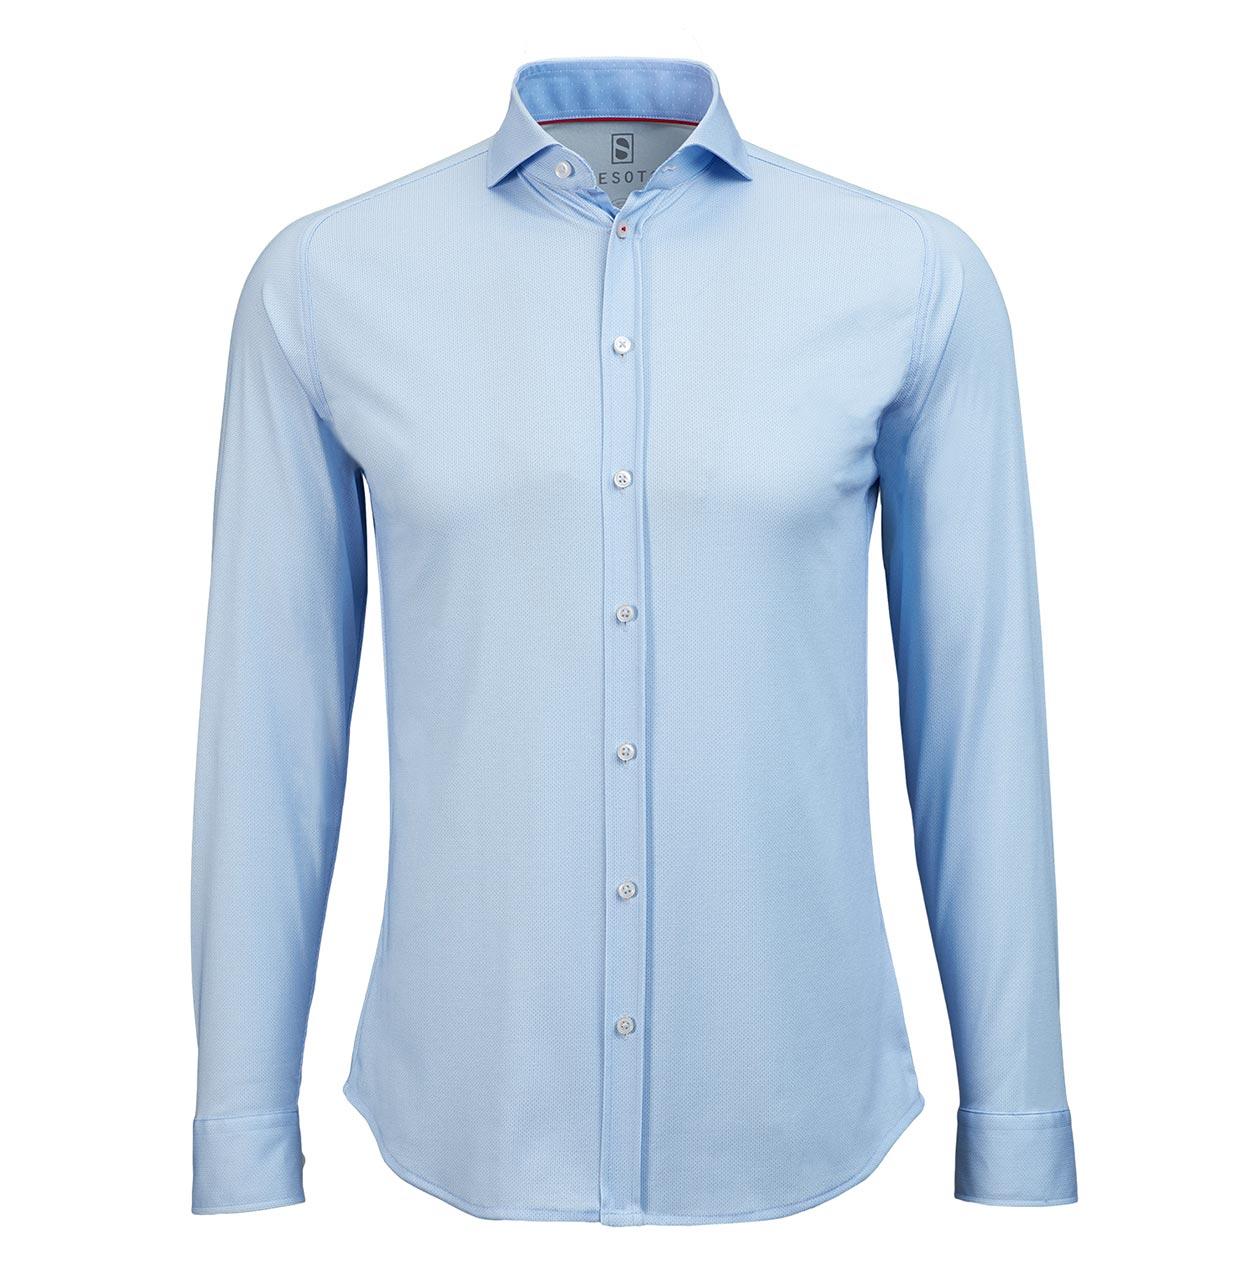 Desoto Shirt 50008 051 50008 blauw Maat M